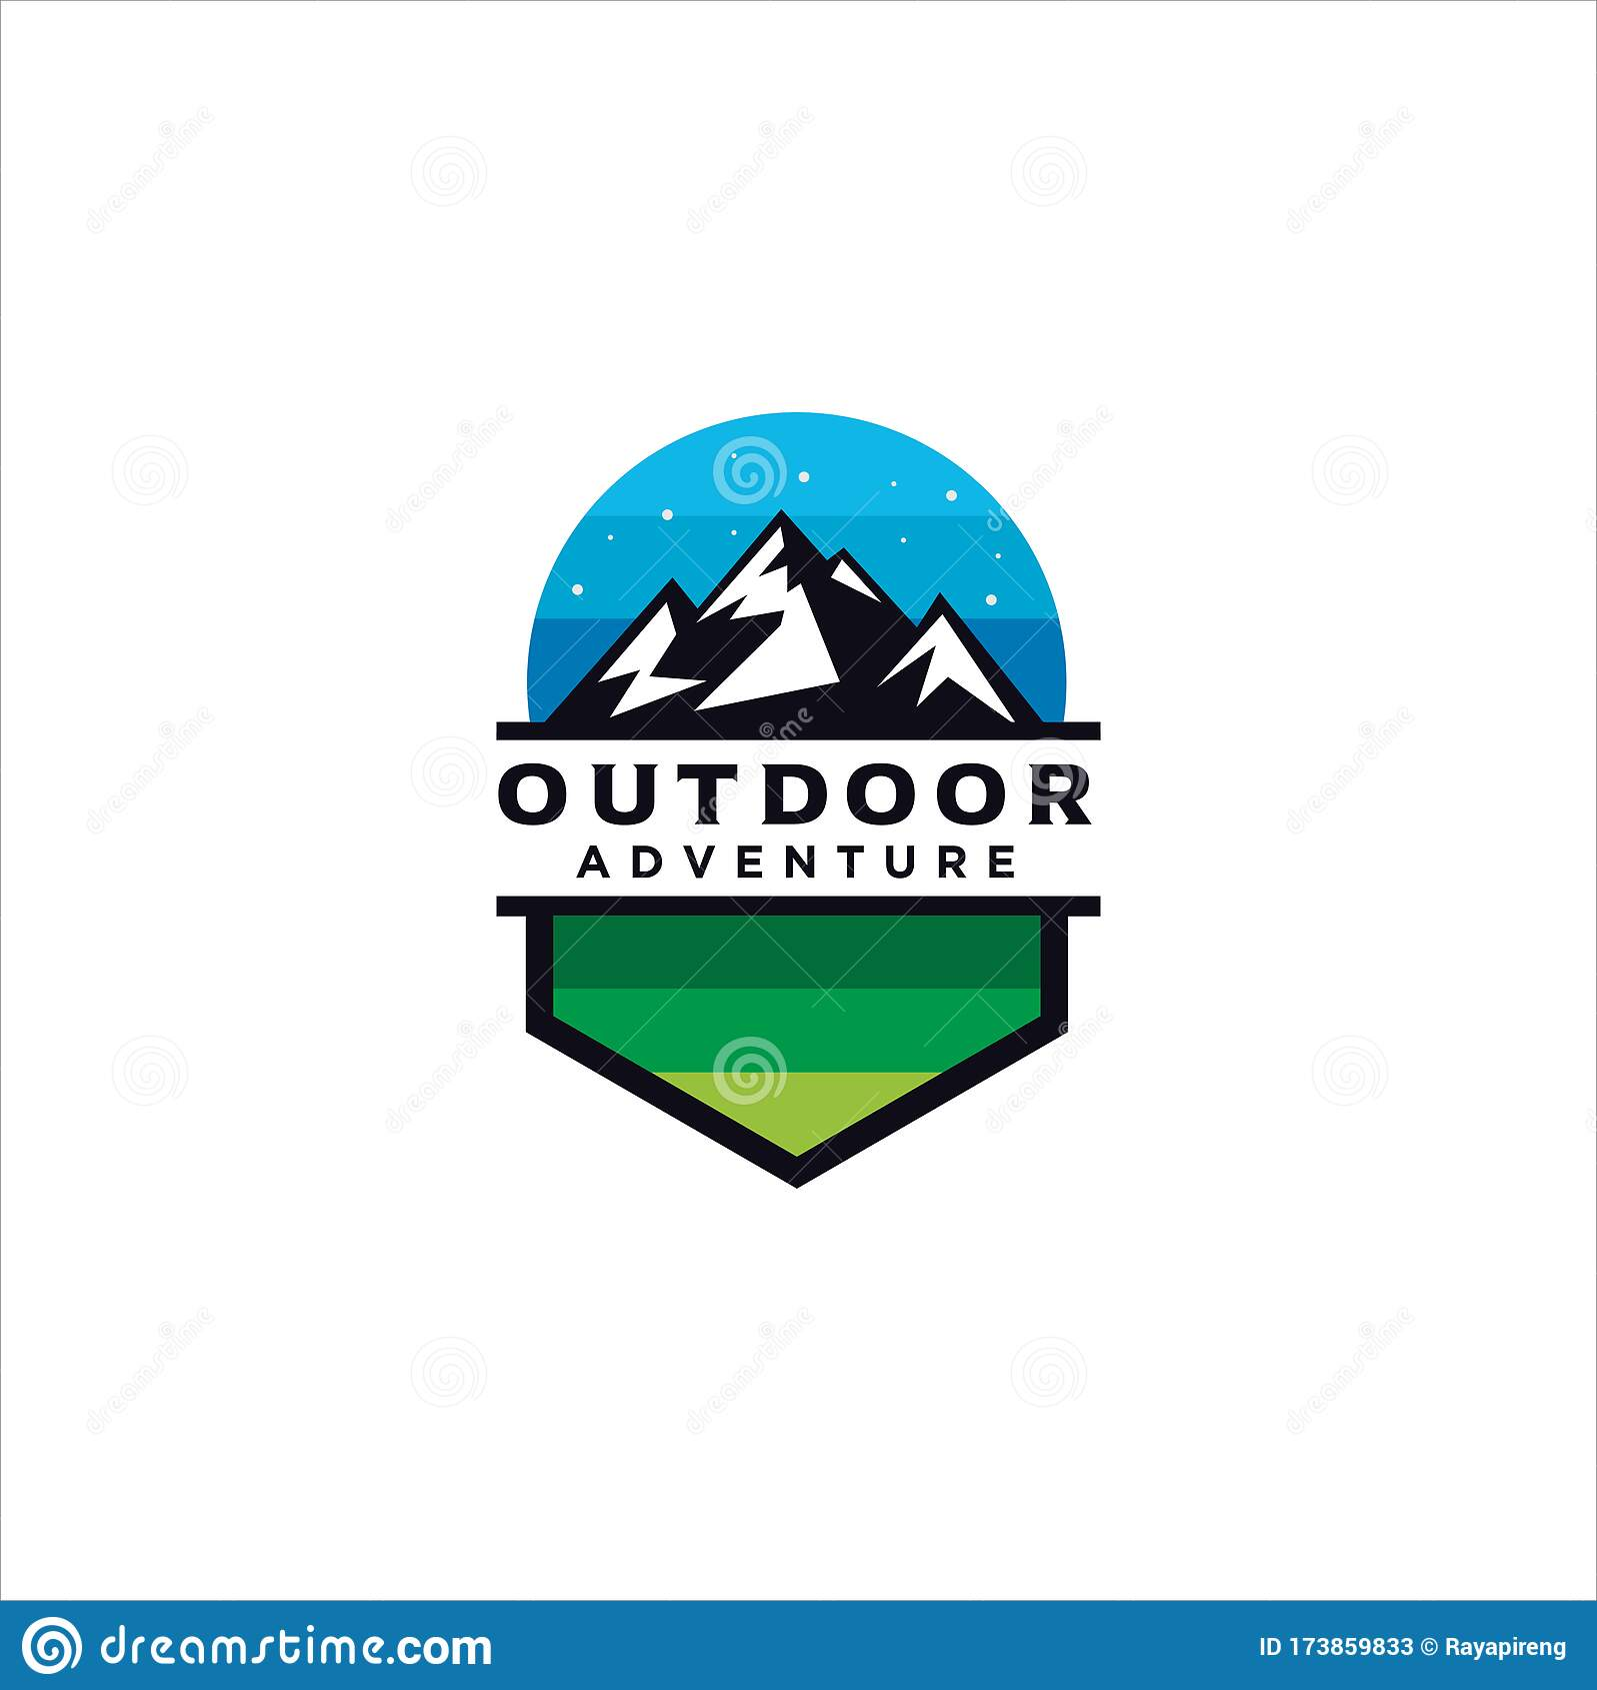 Alpine Mountain Adventure Logo Mountain Outdoor Logo Design Hiking Camping Expedition And Outdoor Adventure Exploring Nature Stock Vector Illustration Of Extreme Logo 173859833